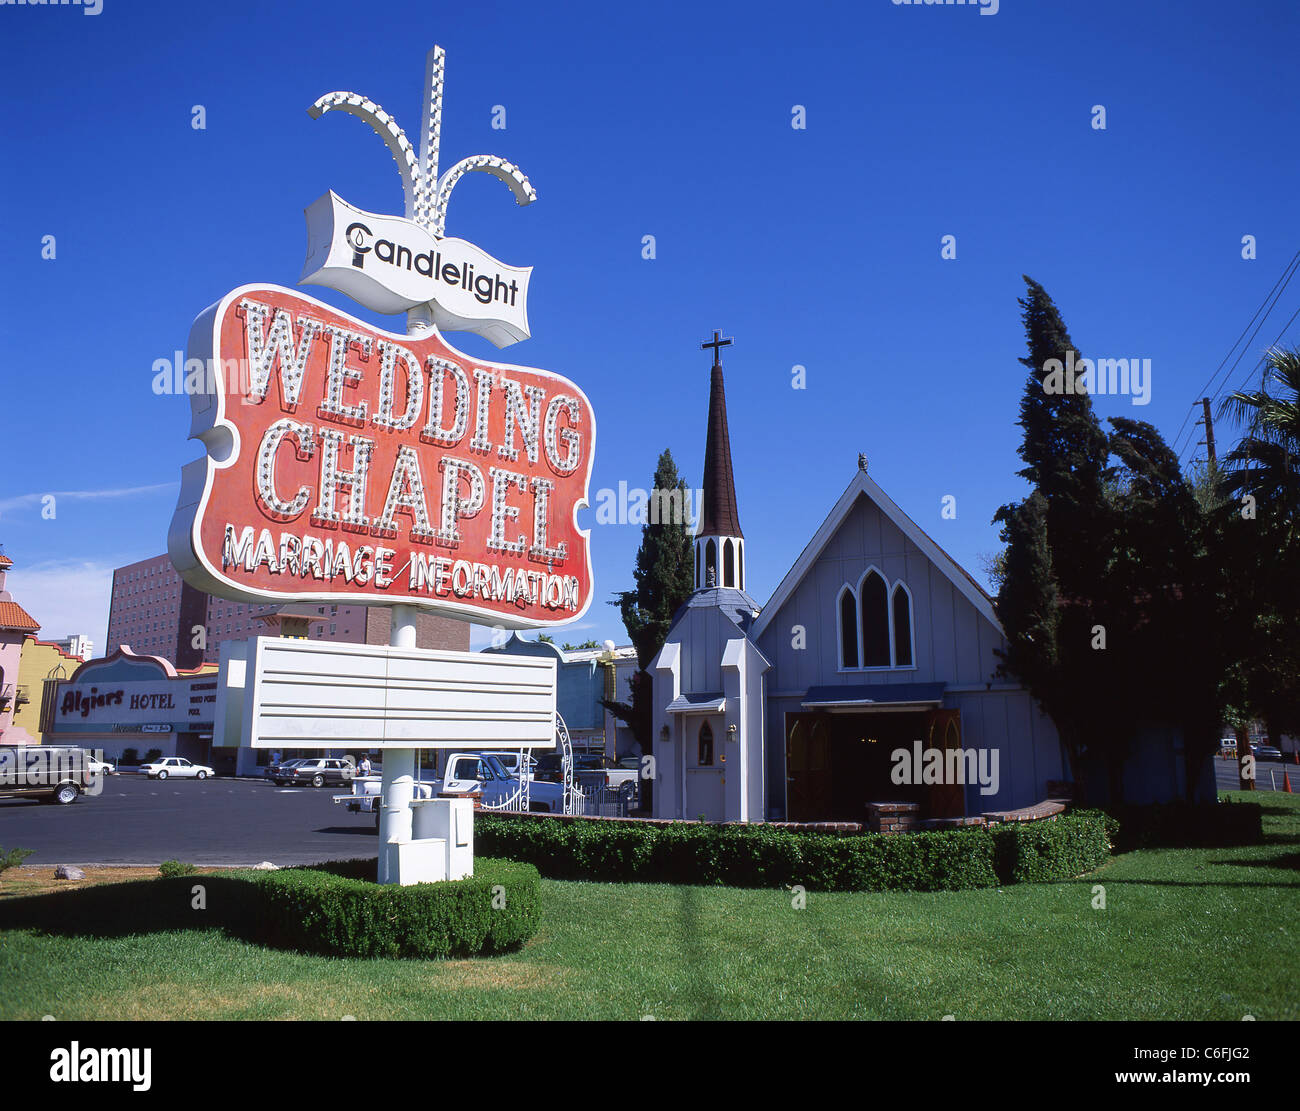 Candlelight Wedding Chapel, Las Vegas Boulevard, Las Vegas, Nevada, United States of America - Stock Image